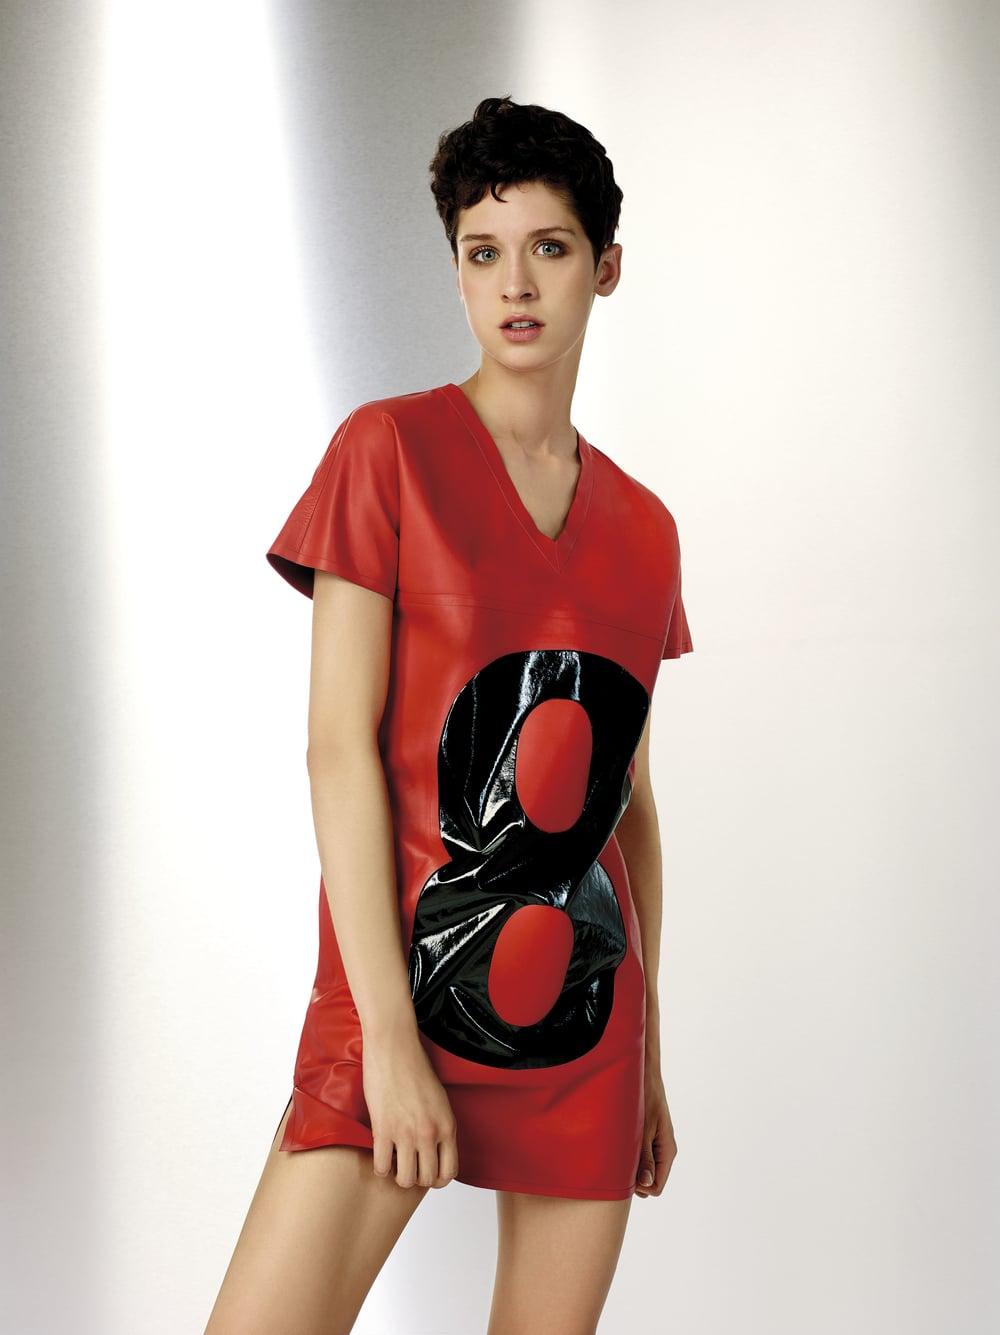 002_Leather_Dress.jpg